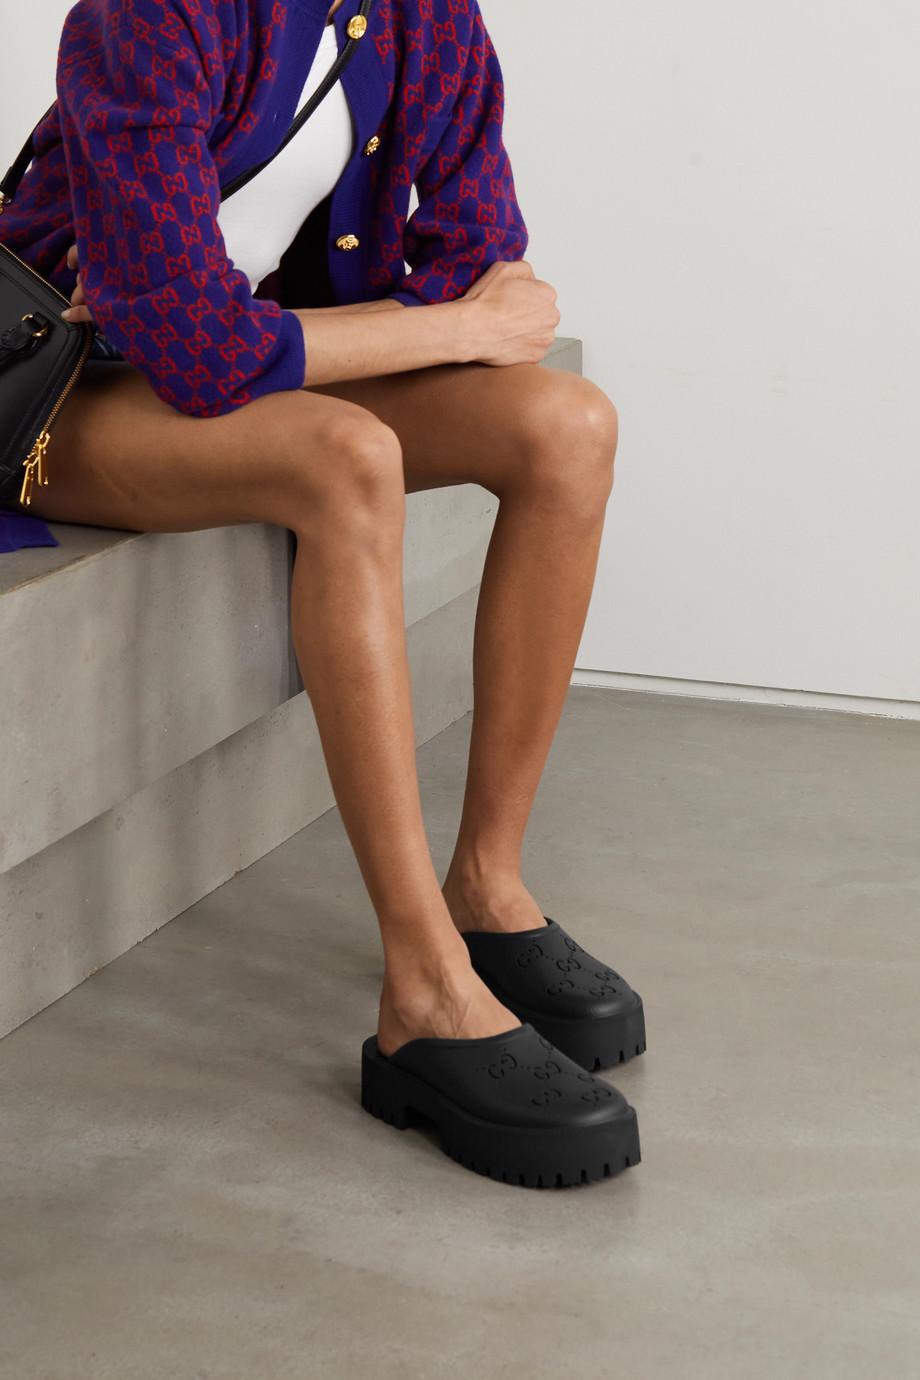 Gucci Elea Mules aus perforiertem Gummi mit Plateau